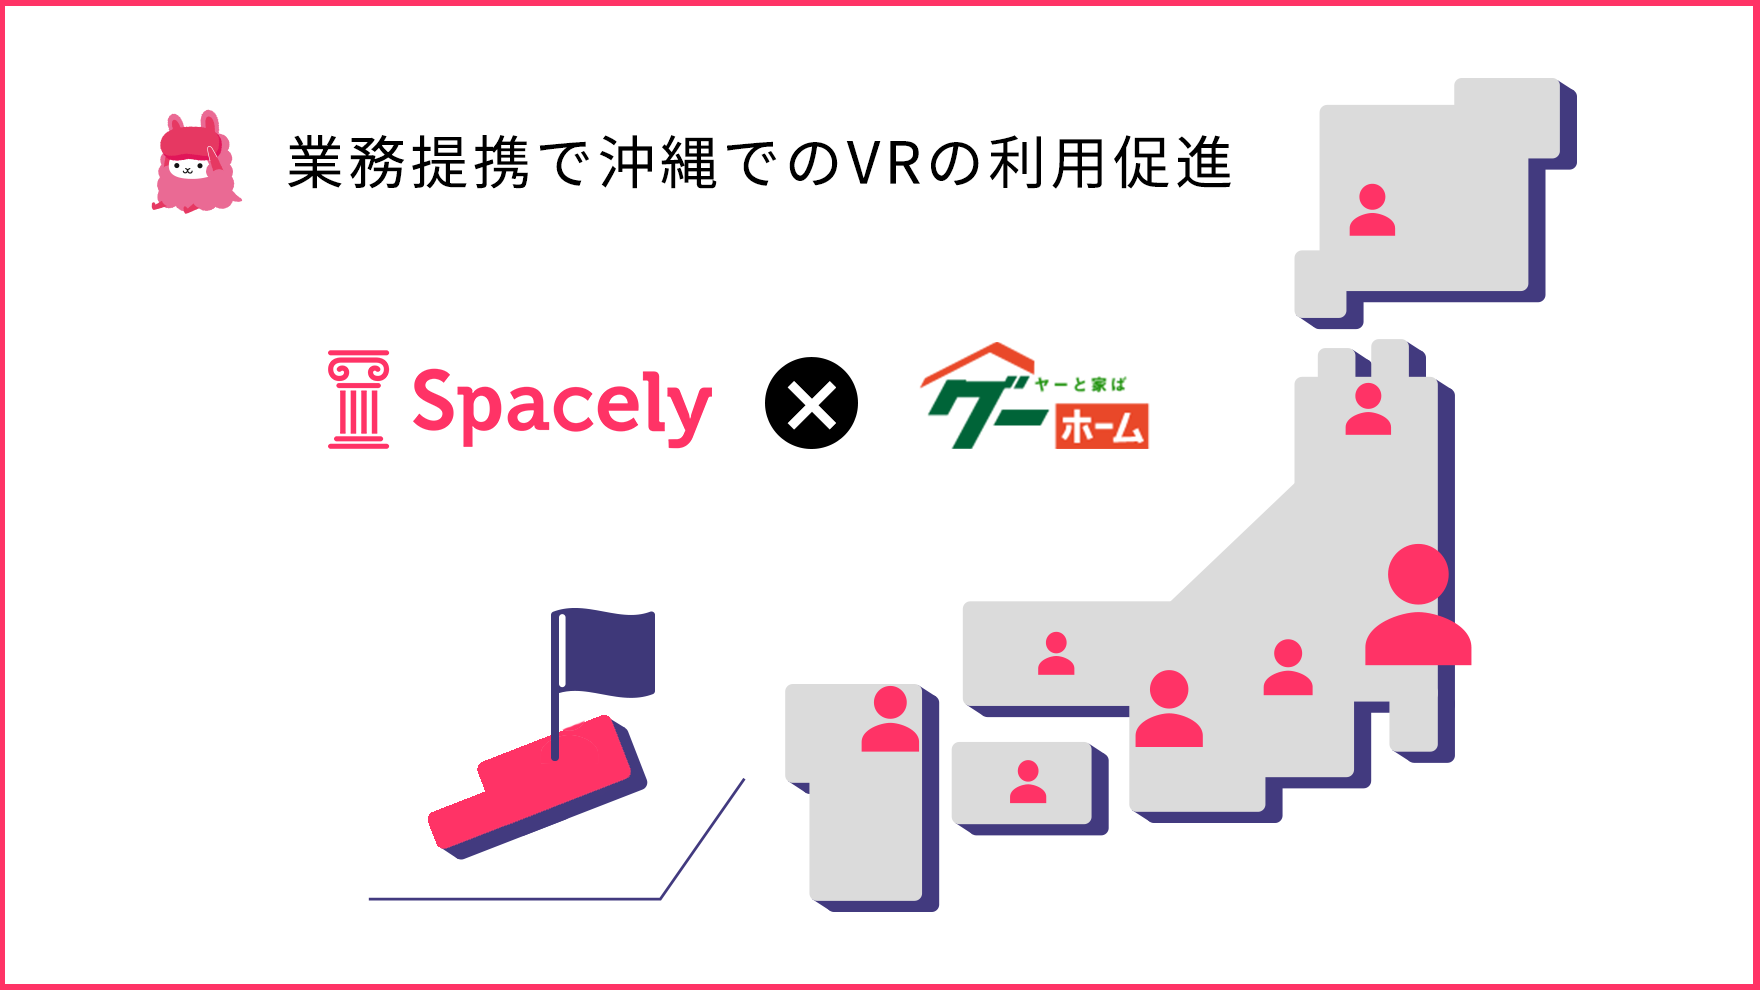 VRクラウド「スペースリー」沖縄県の不動産物件掲載数最大級の「グーホーム」と業務提携